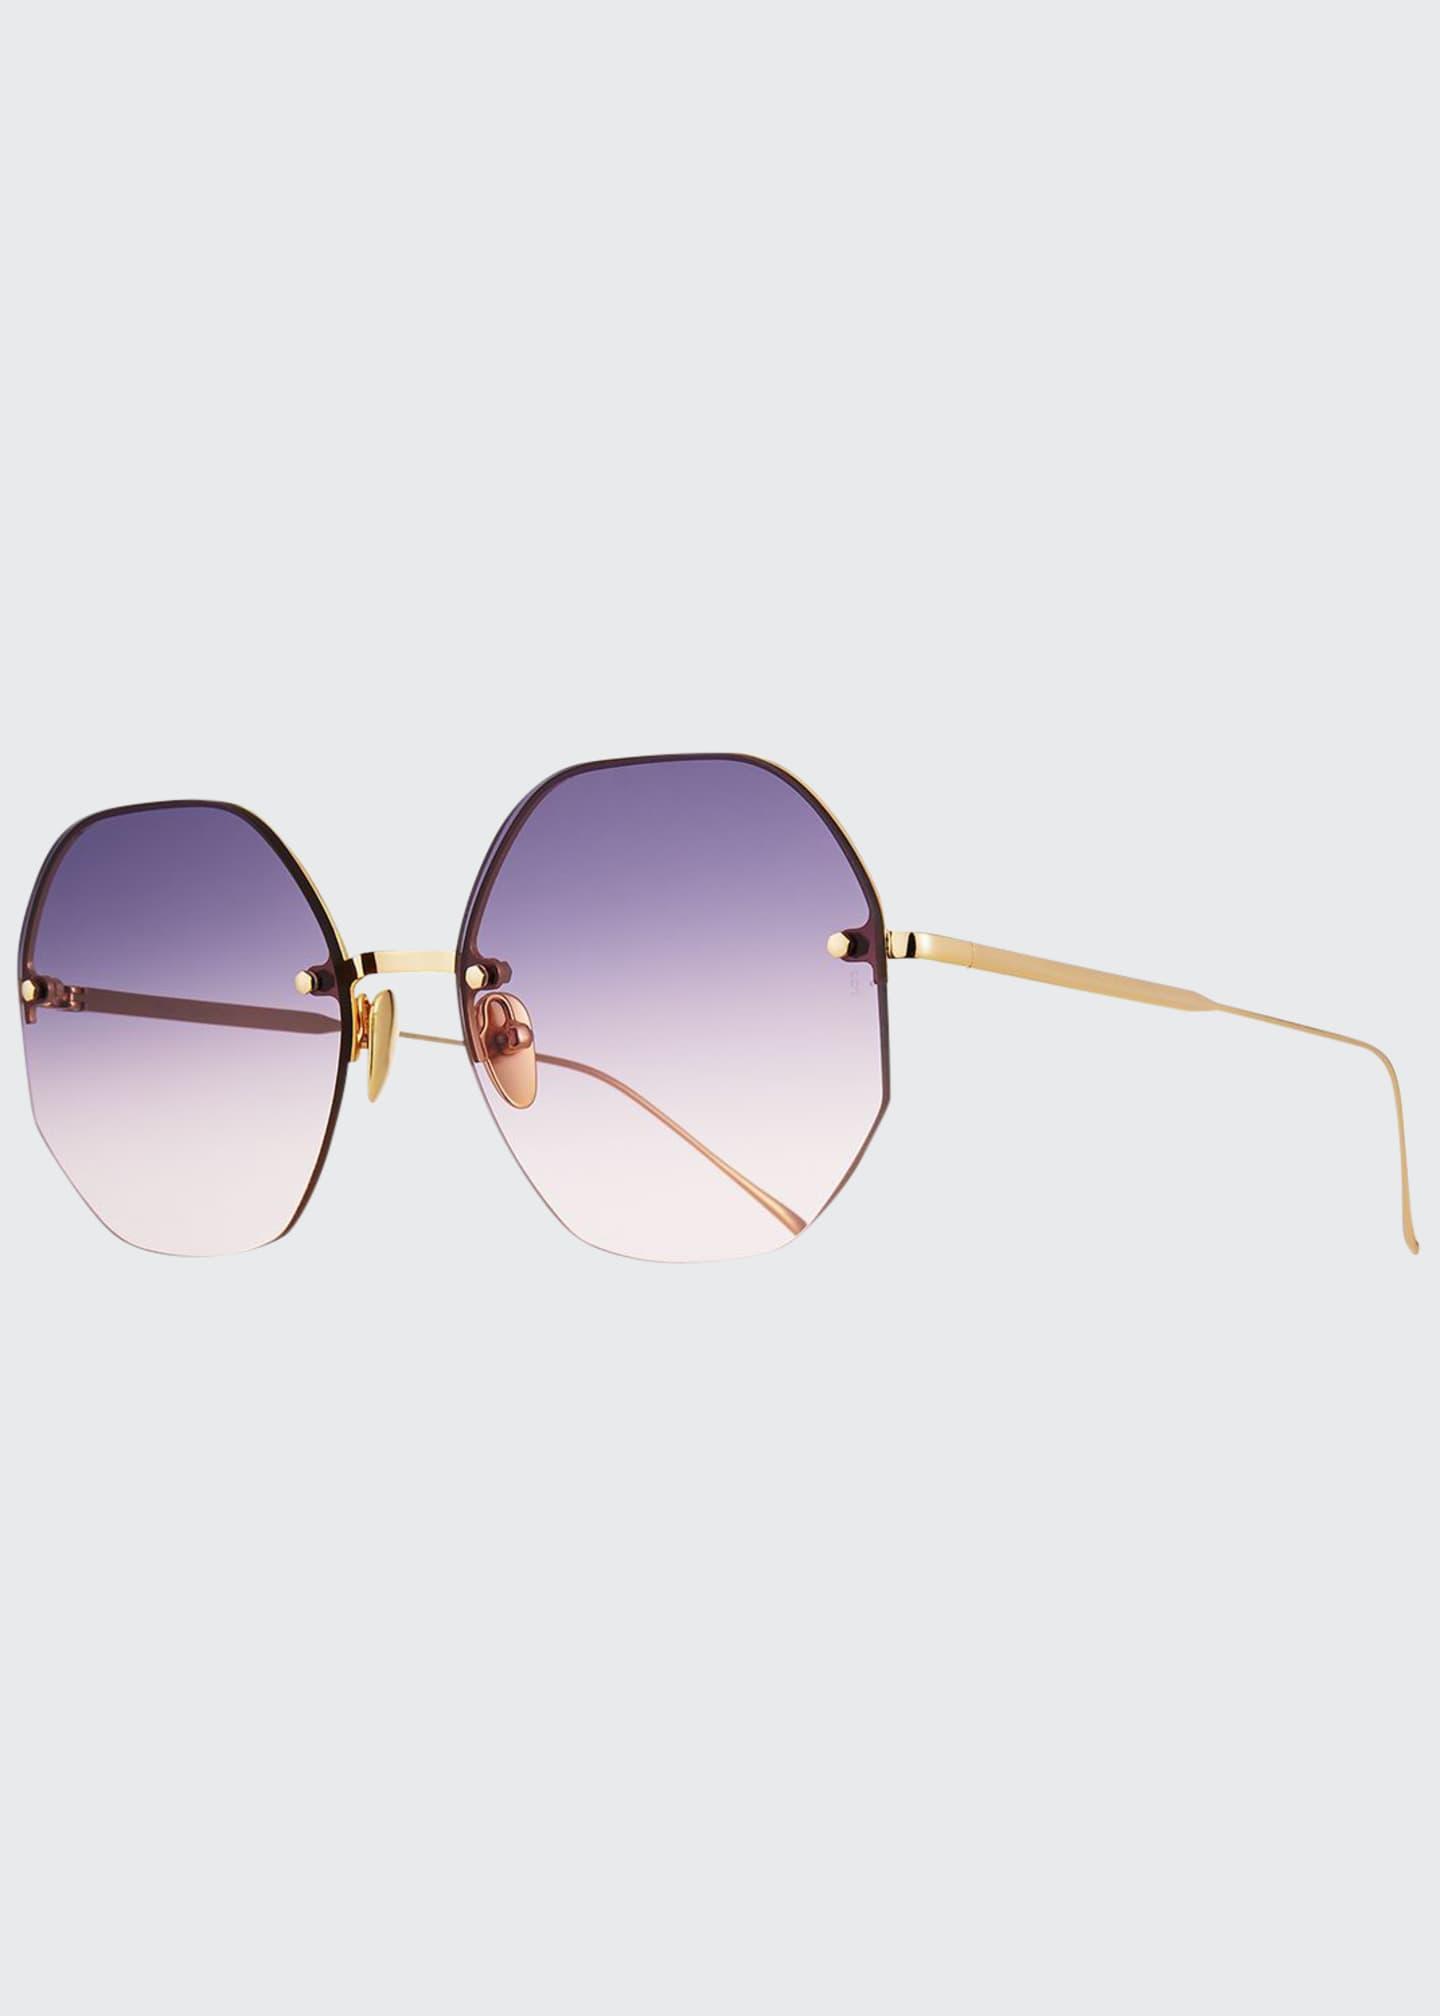 Sunday Somewhere Mia Rimless Octagonal Sunglasses